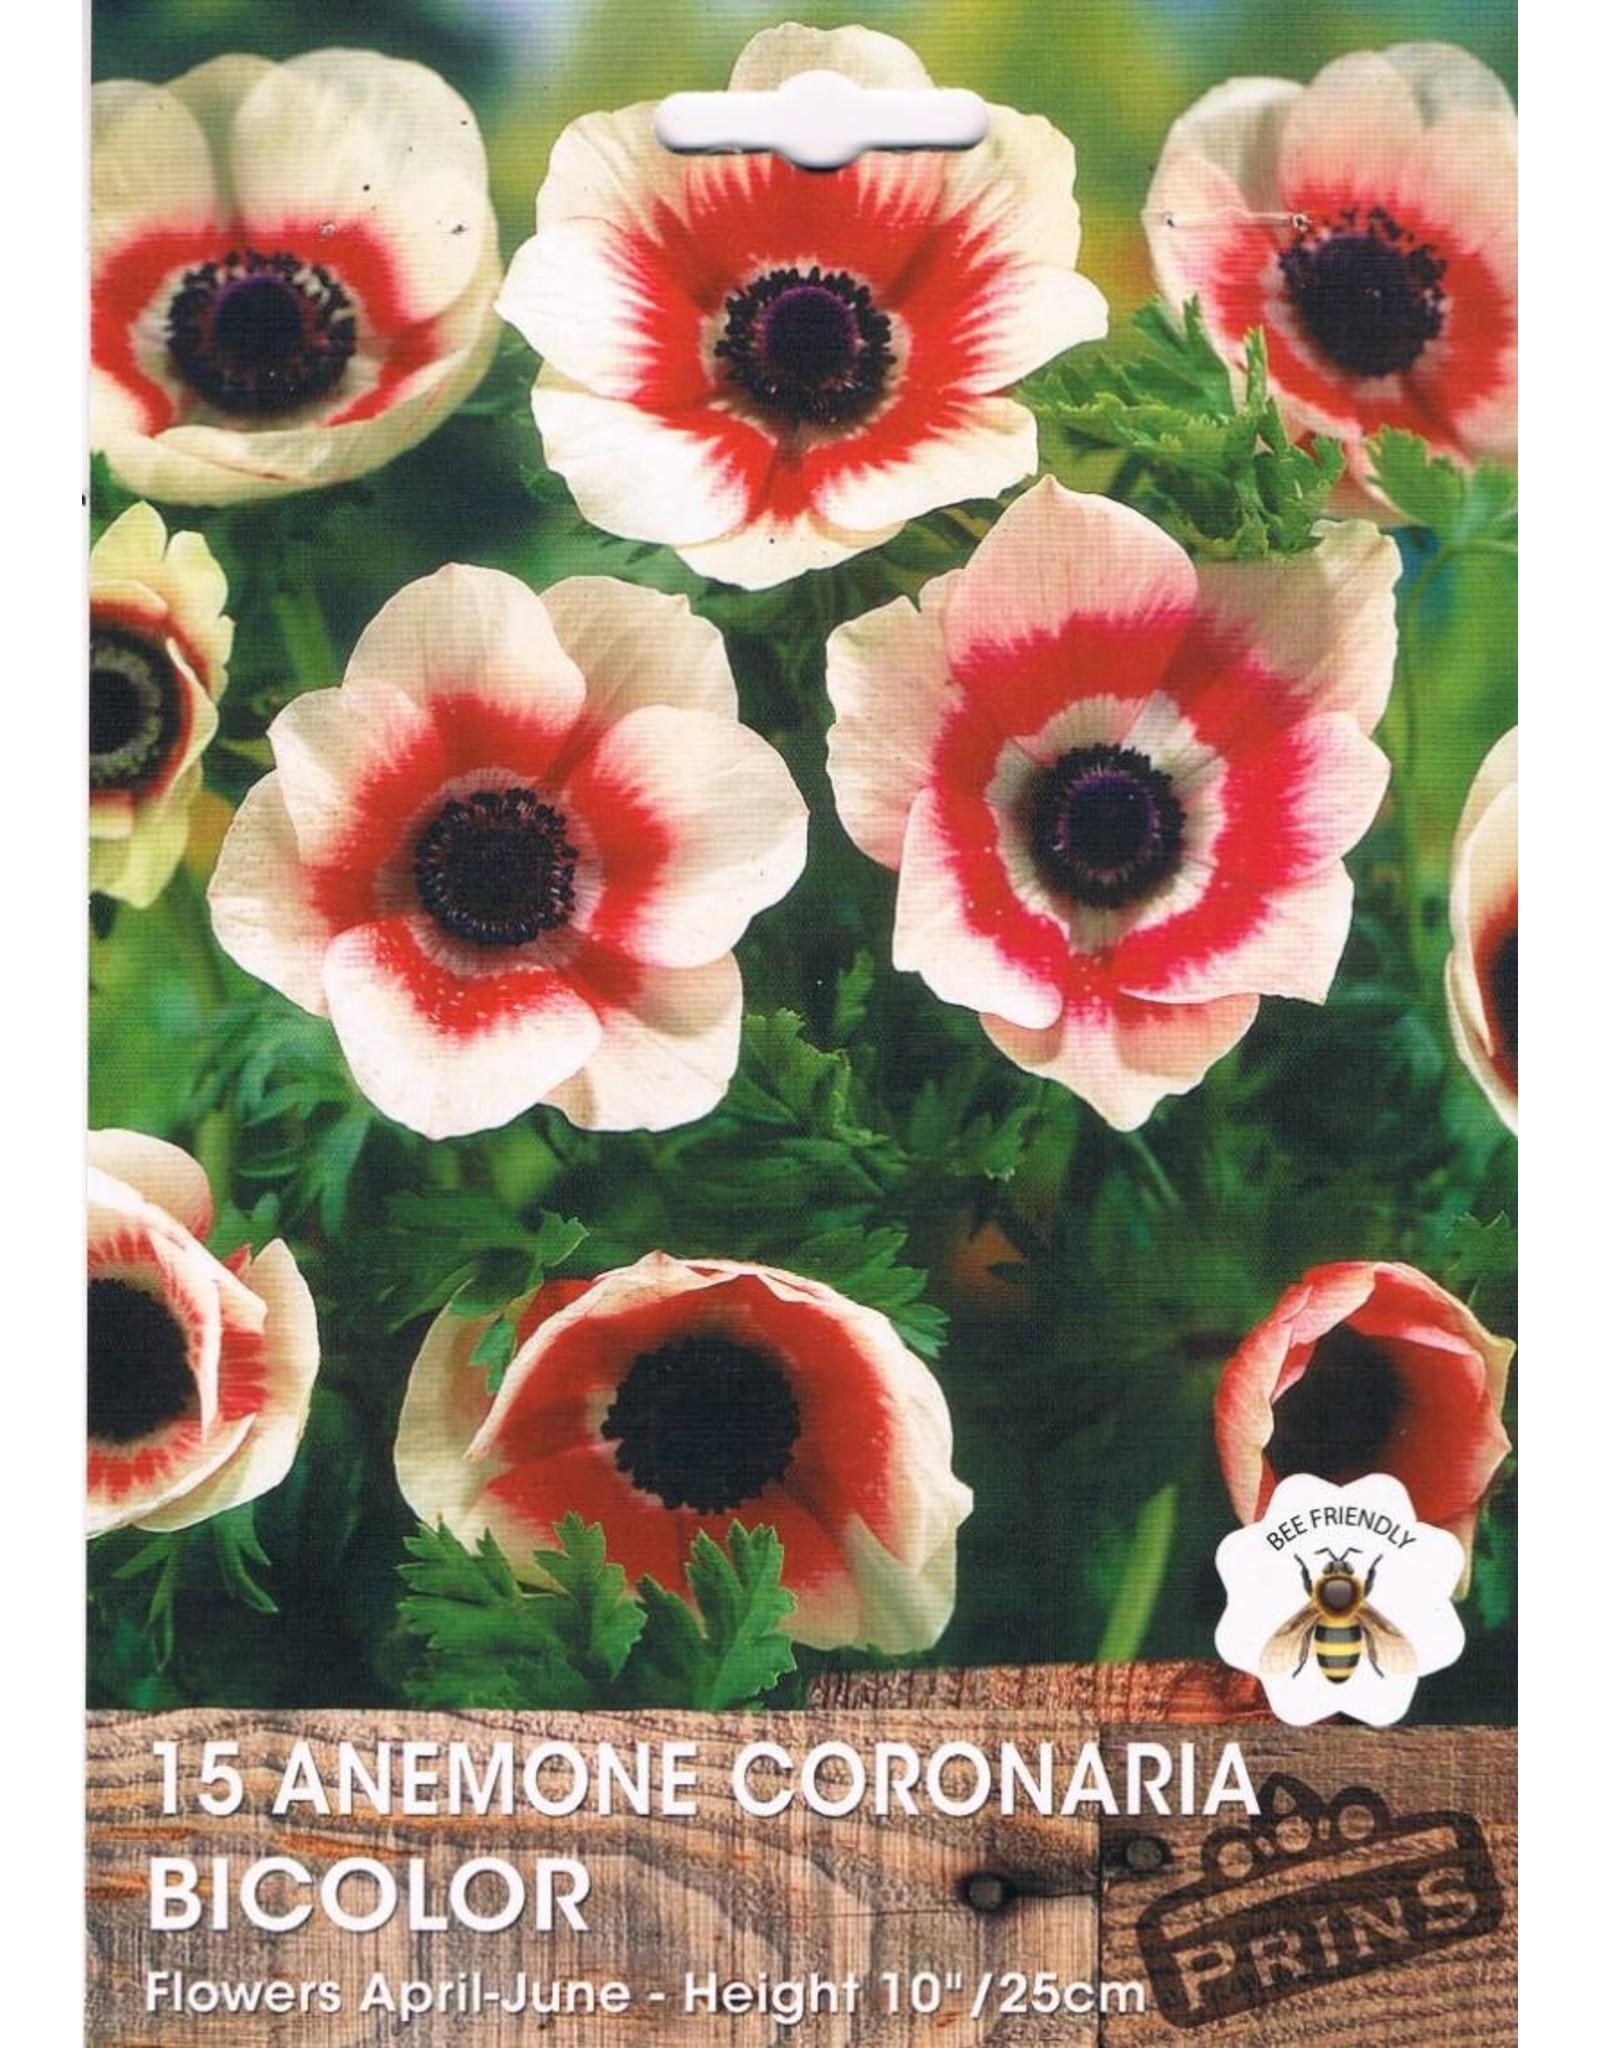 Hollands geteeld Anemone coronaria Bicolor